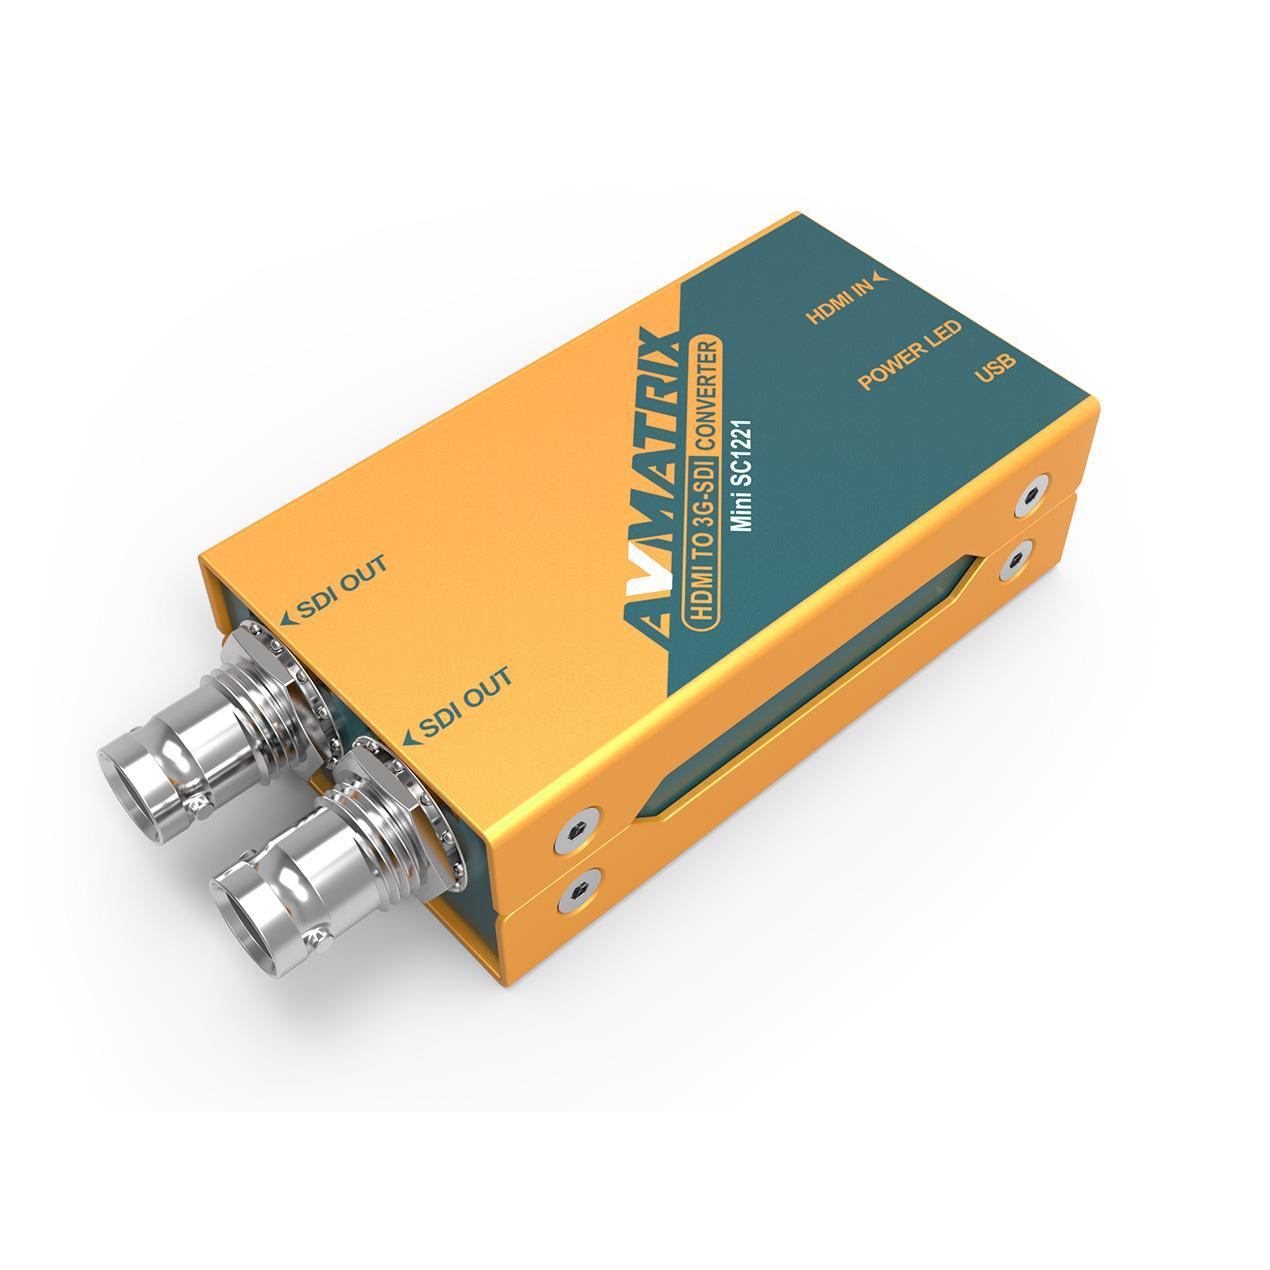 AVMATRIX HDMI to 3G-SDI Pocket-size broadcast Converter 2